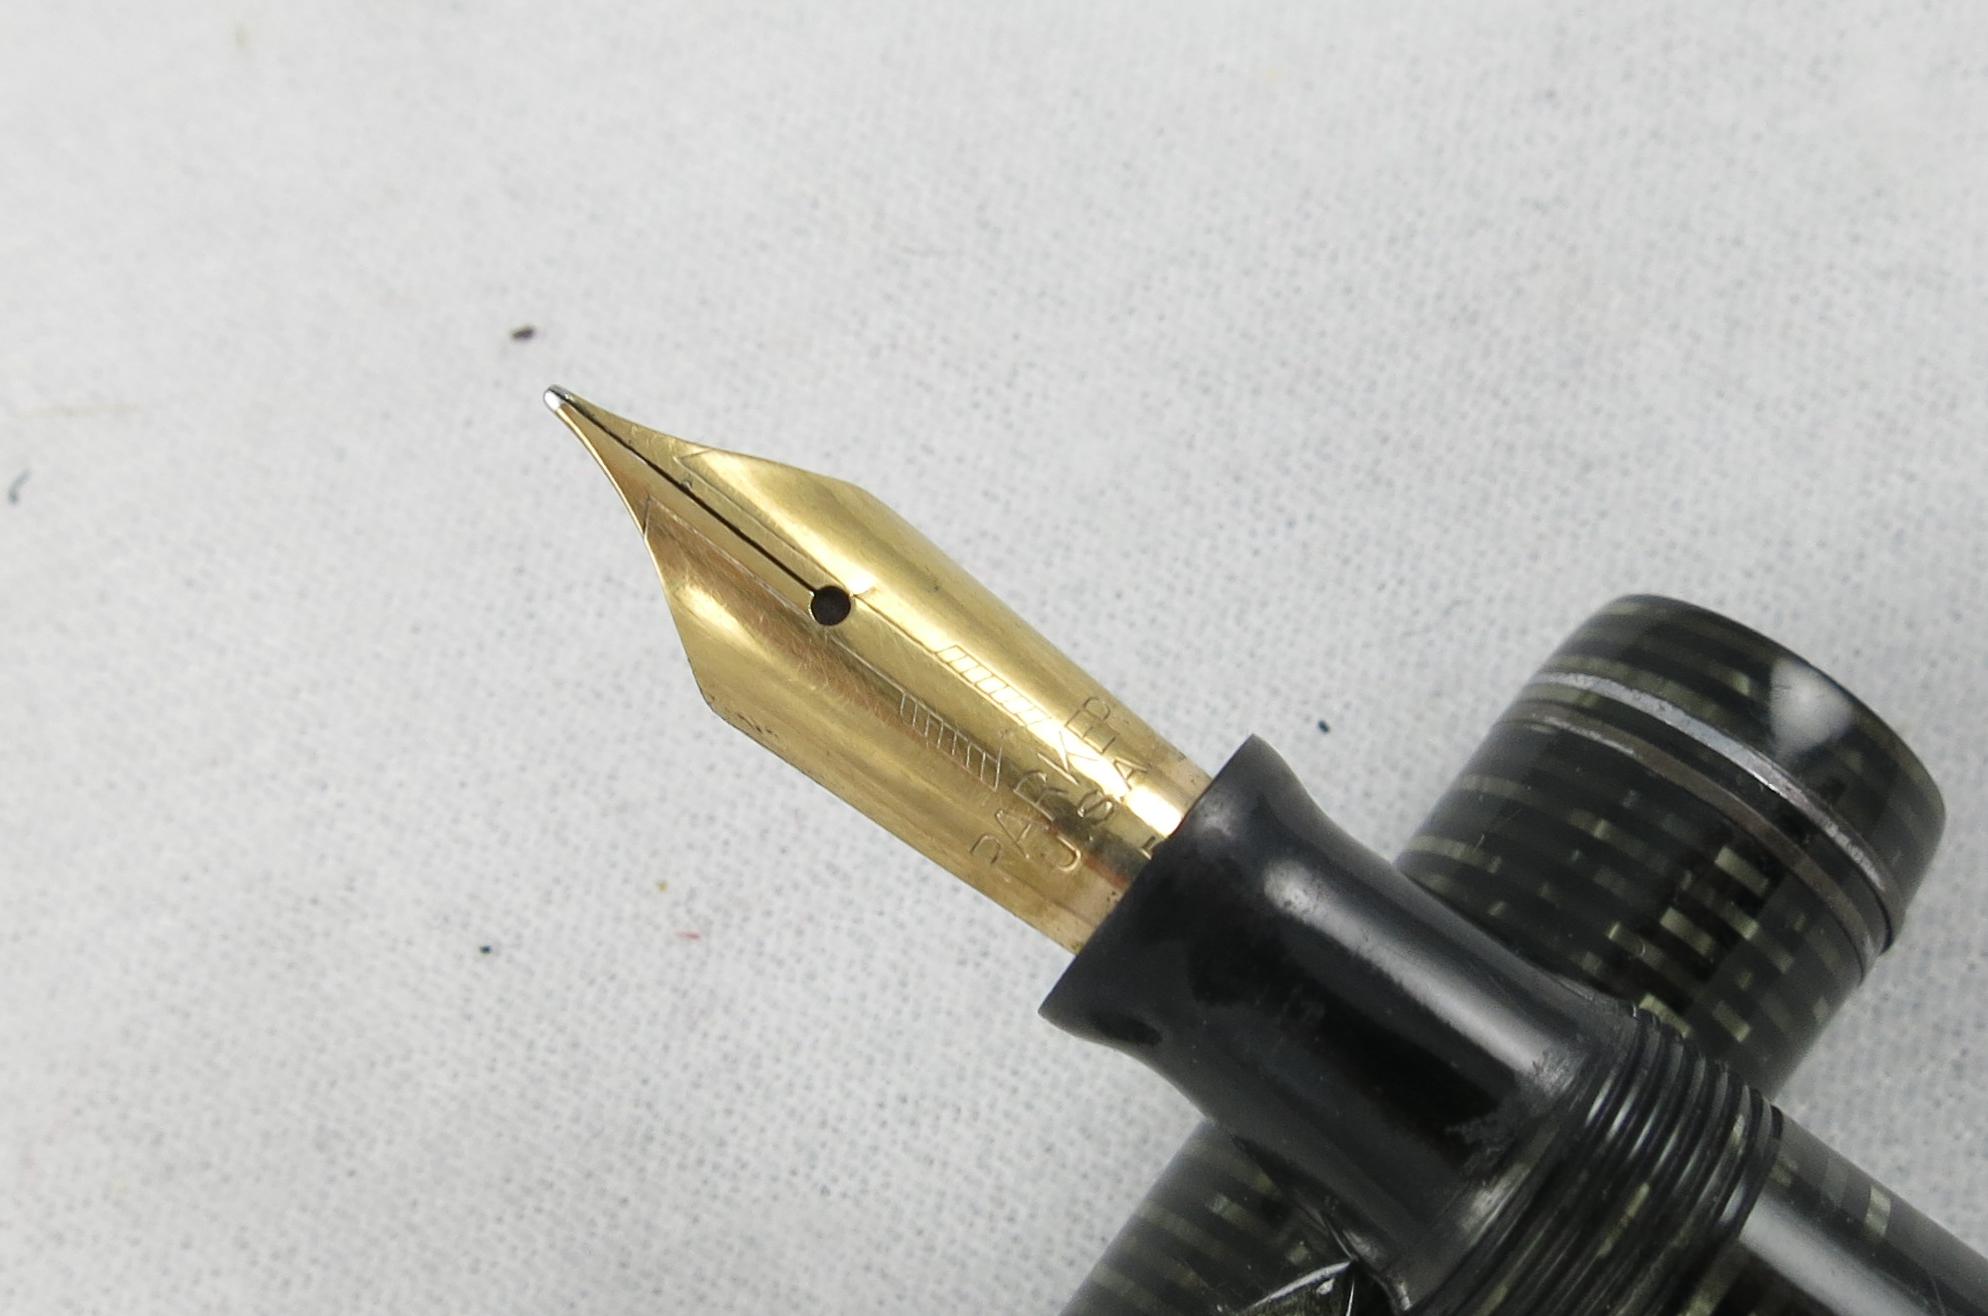 Parker Vacumatic - Silver Pearl, two-band cap - 1945 (Pen 2189)